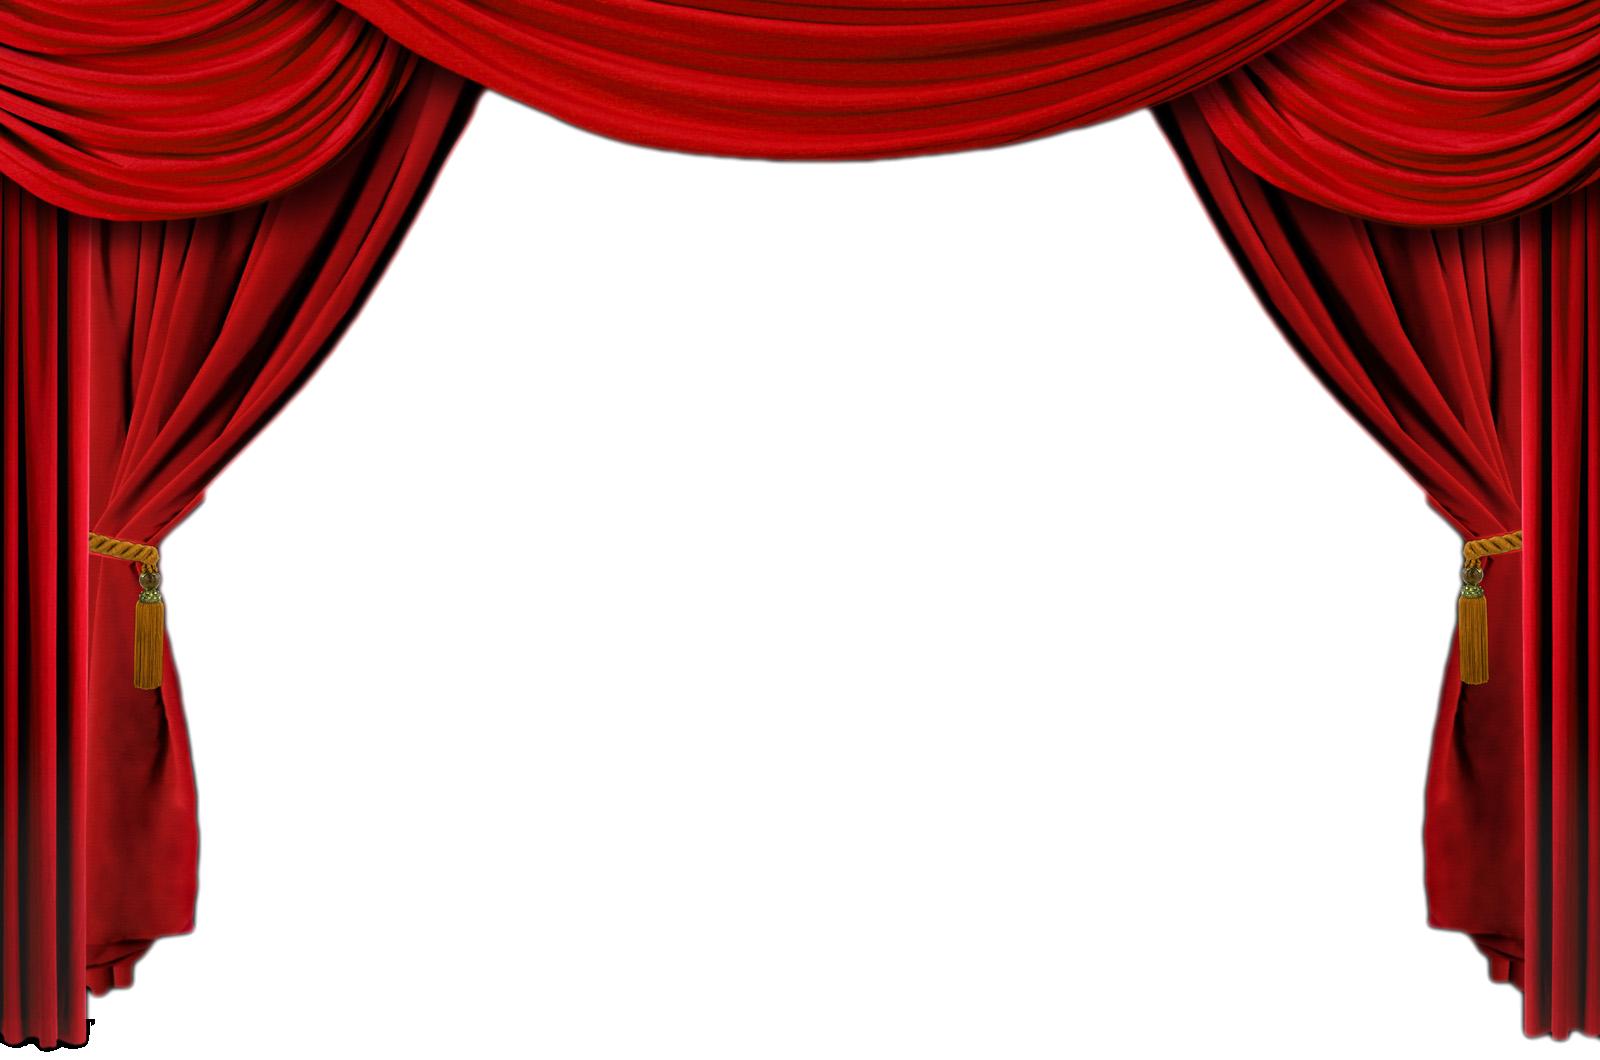 Curtain file